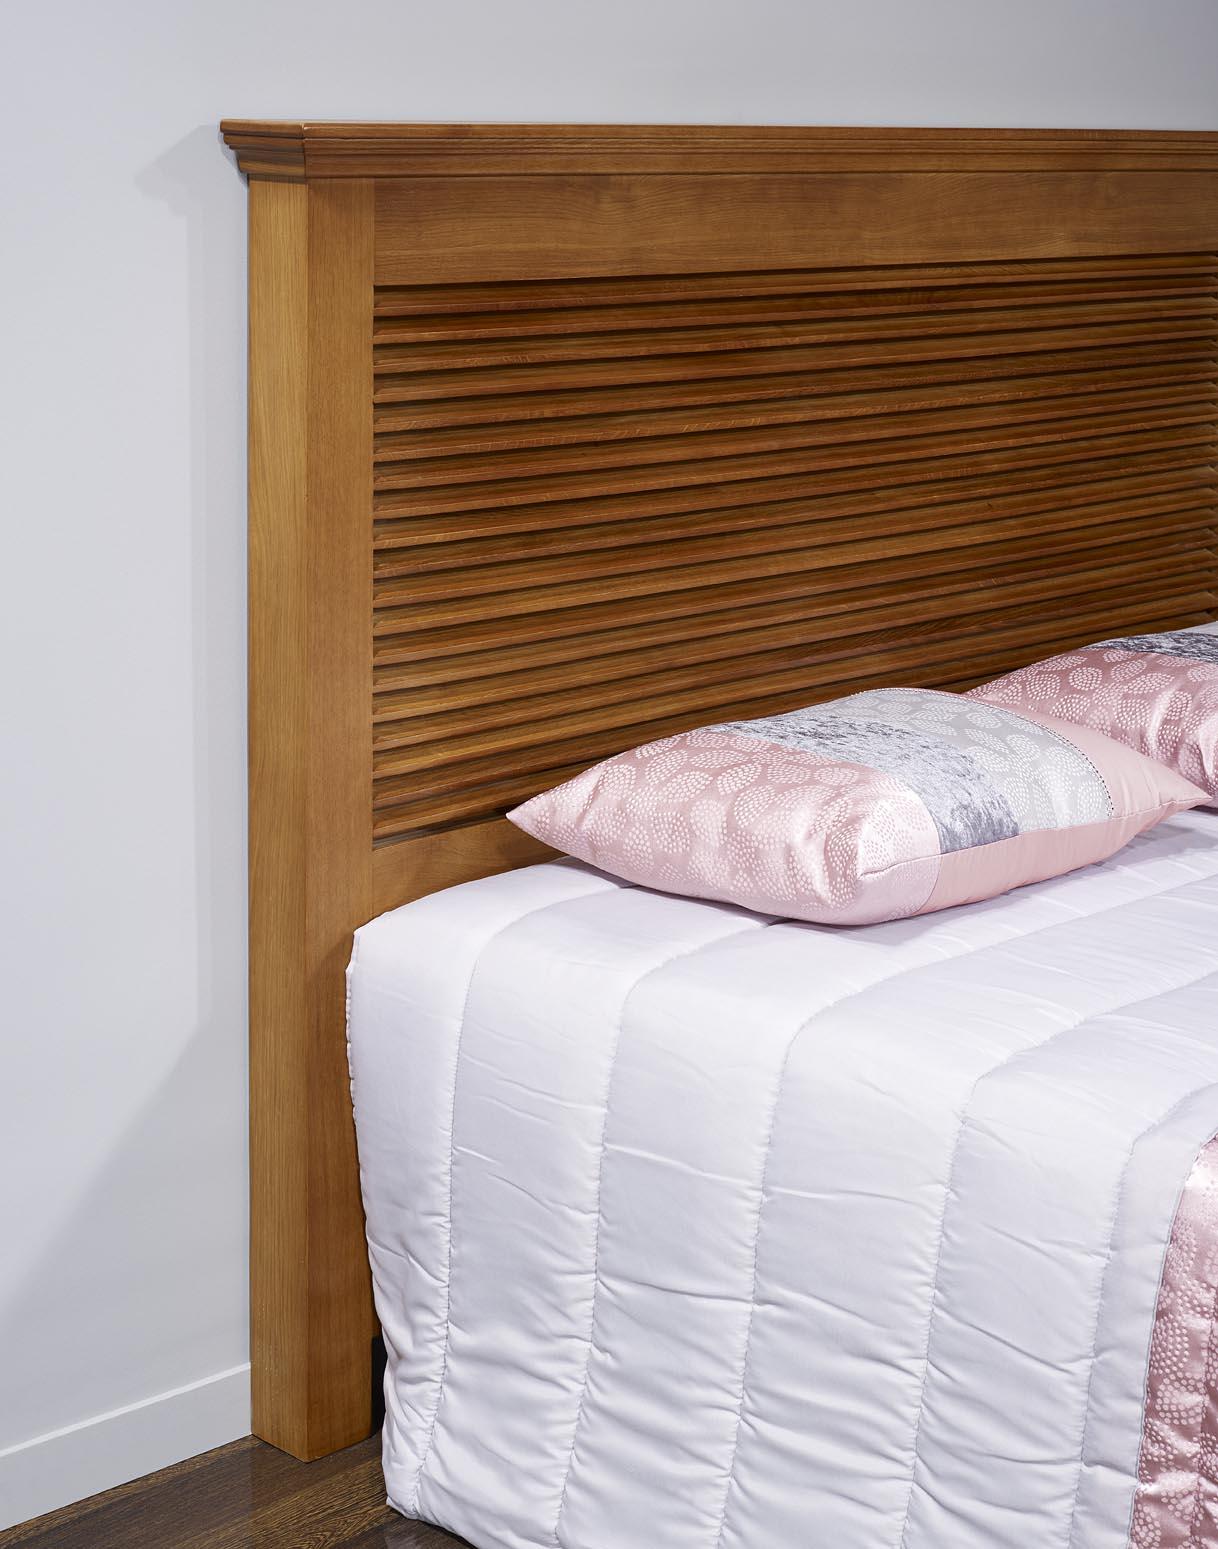 t te de lit en ch ne massif de style campagne meuble en ch ne massif. Black Bedroom Furniture Sets. Home Design Ideas